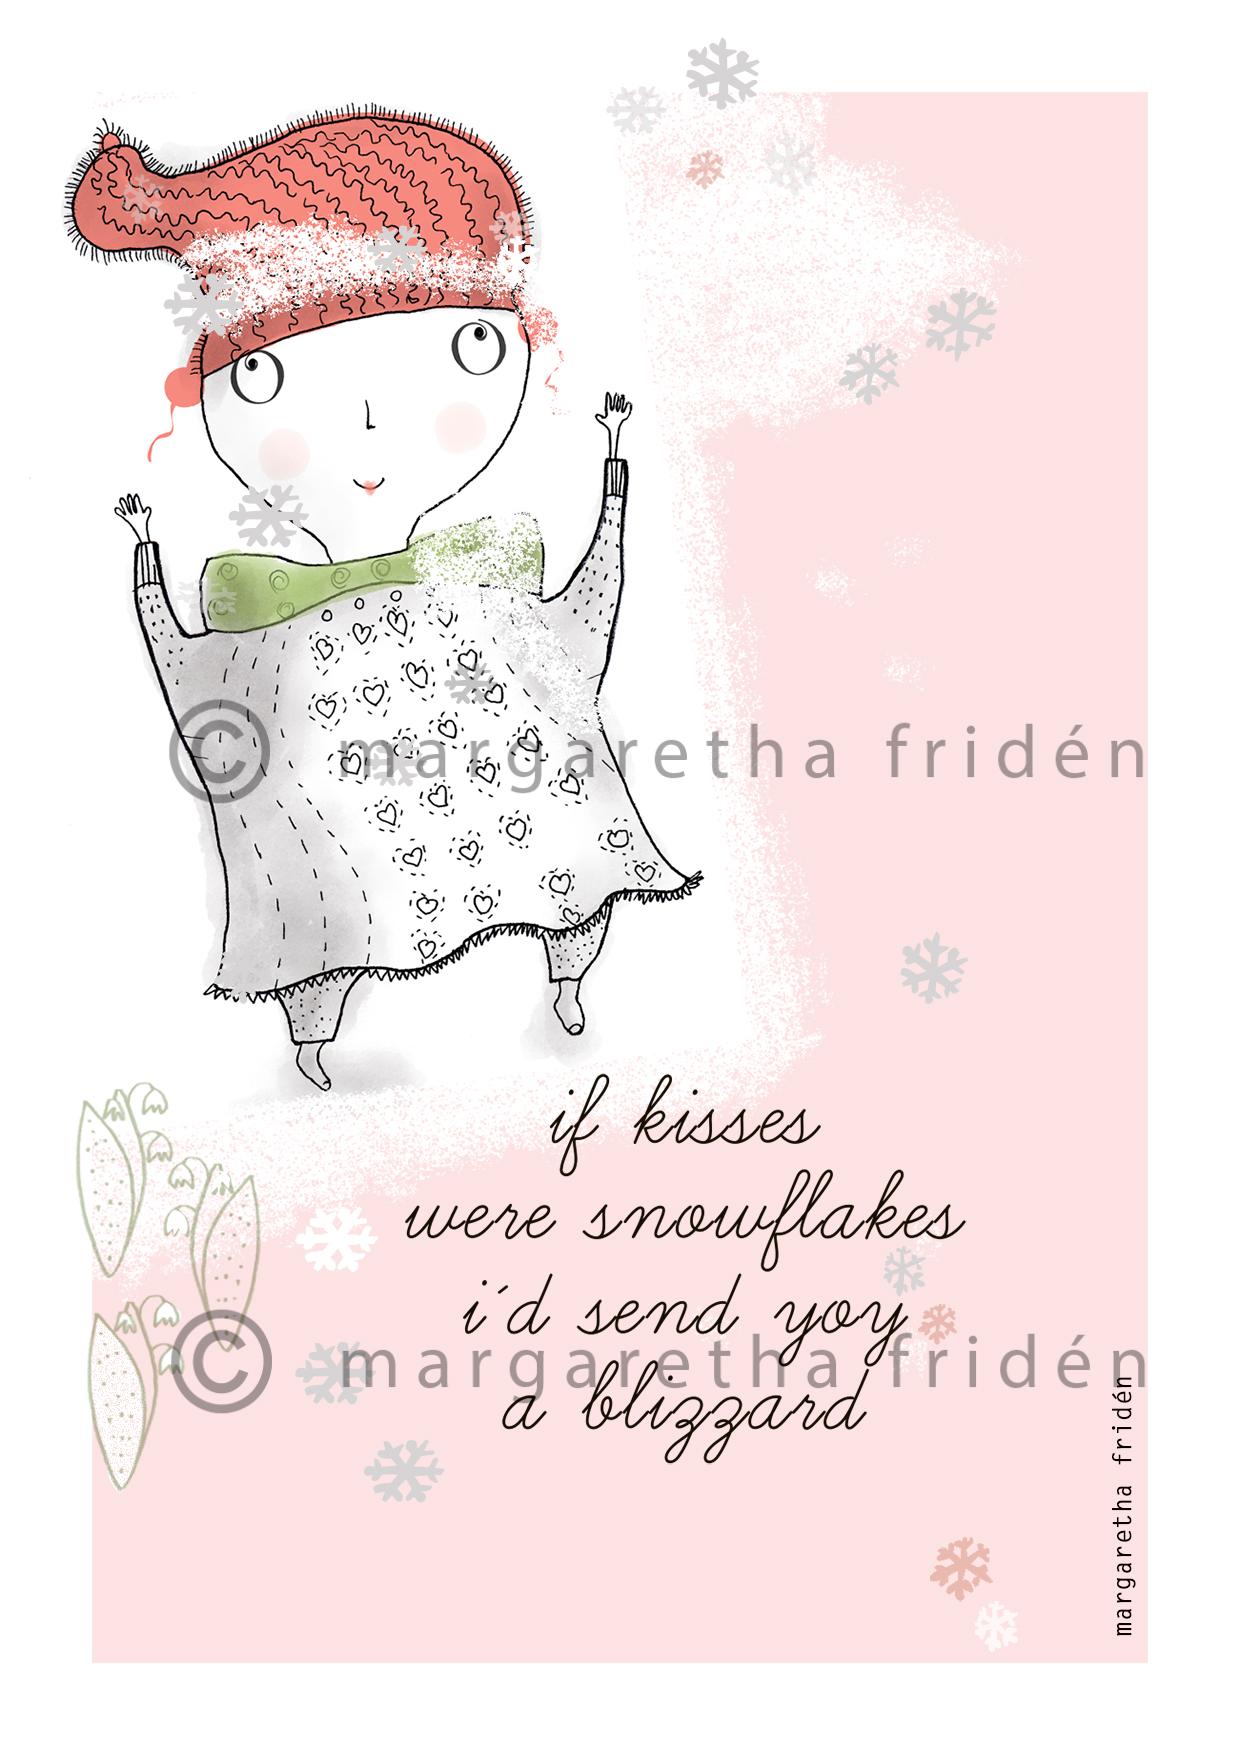 Julkort 6. If kisses were snowflakes i´d send you a blizzard- margaretafriden.se